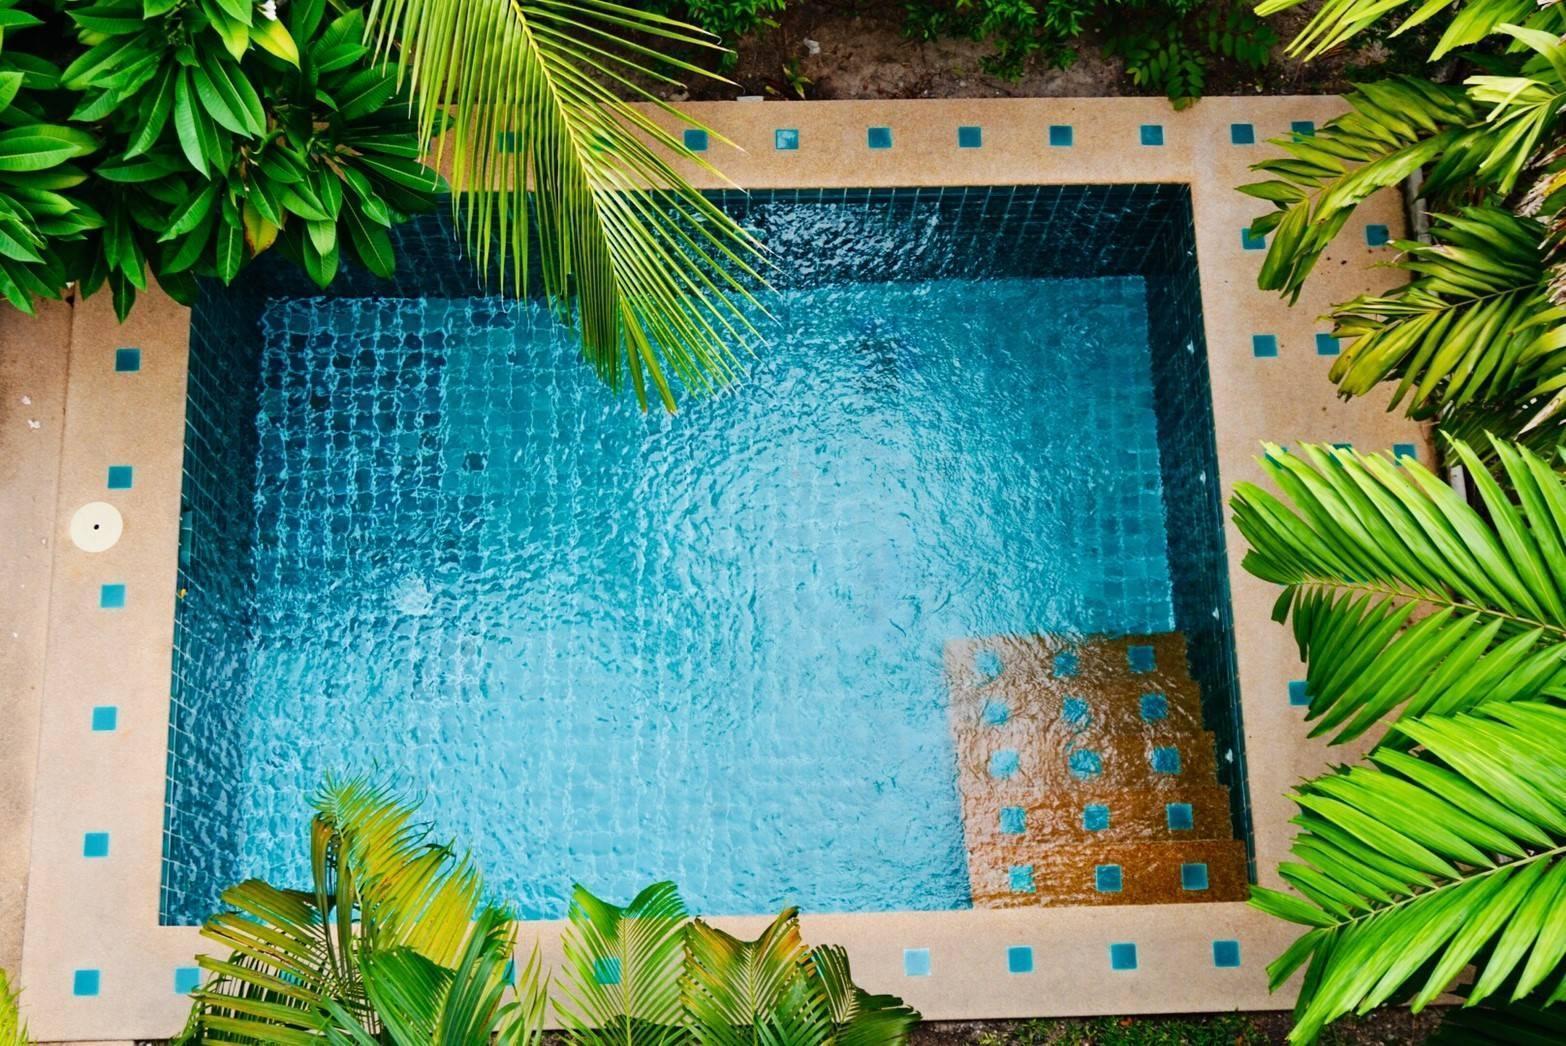 TARA Pool Villas Pattaya with Rooftop Jacuzzi วิลลา 2 ห้องนอน 3 ห้องน้ำส่วนตัว ขนาด 220 ตร.ม. – เขาพระตำหนัก